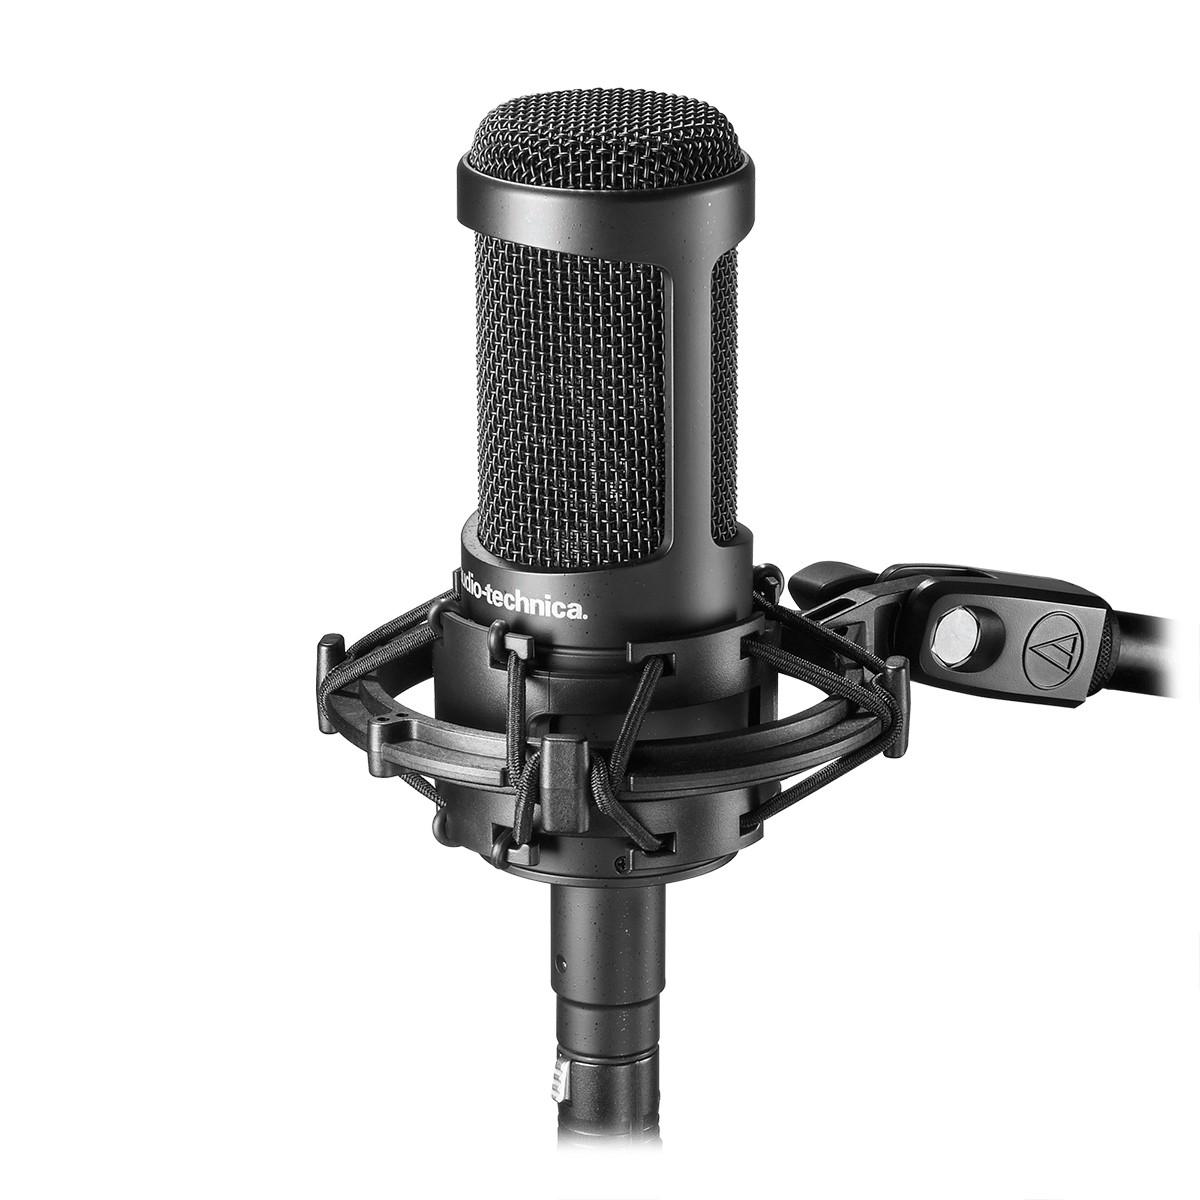 Microfone de Capsula Mutável Audio-Technica AT2050